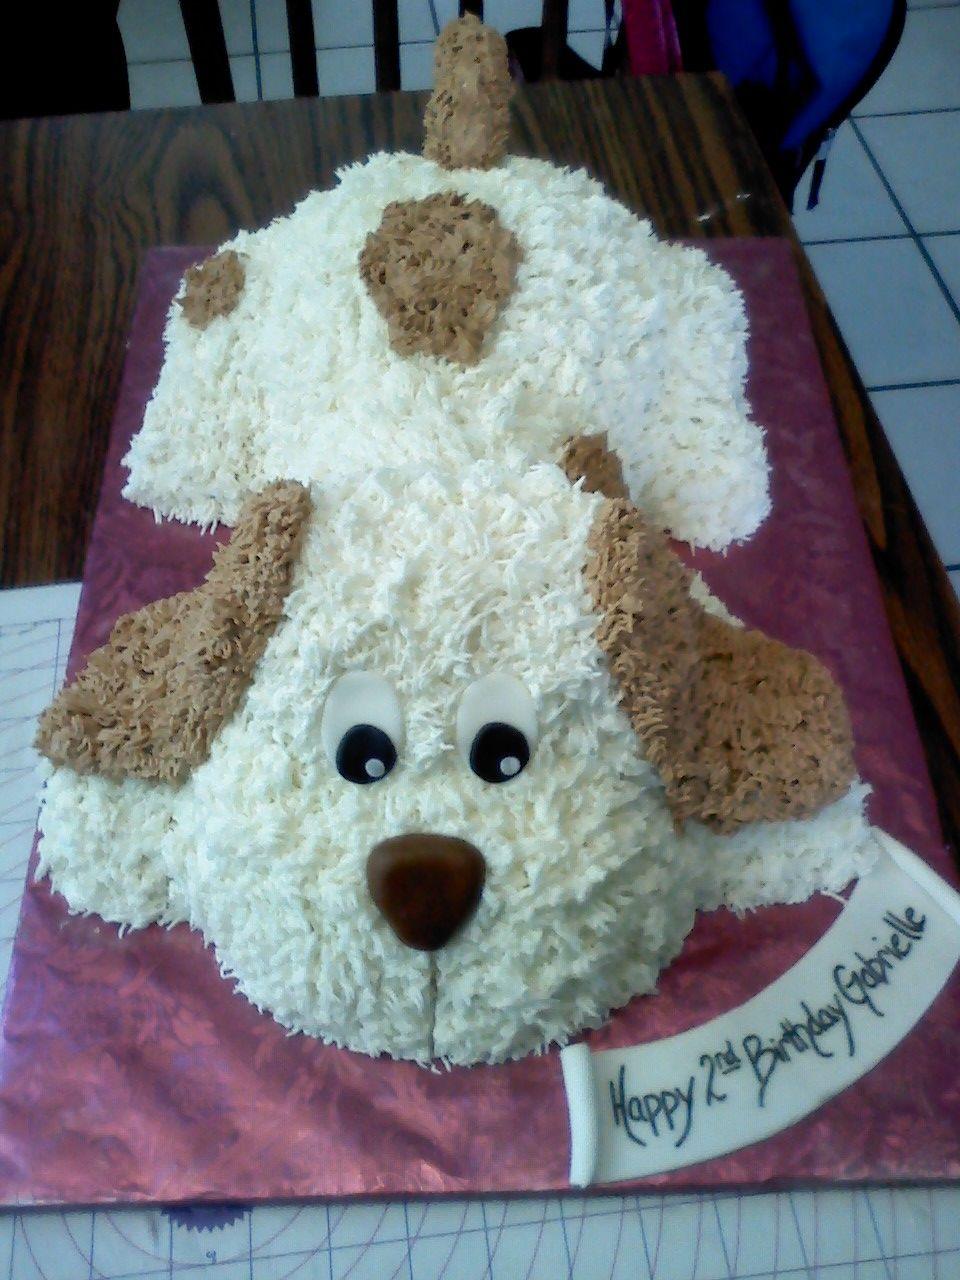 wwwfacebookcomnikkiscreativeconfections puppy cake buttercream